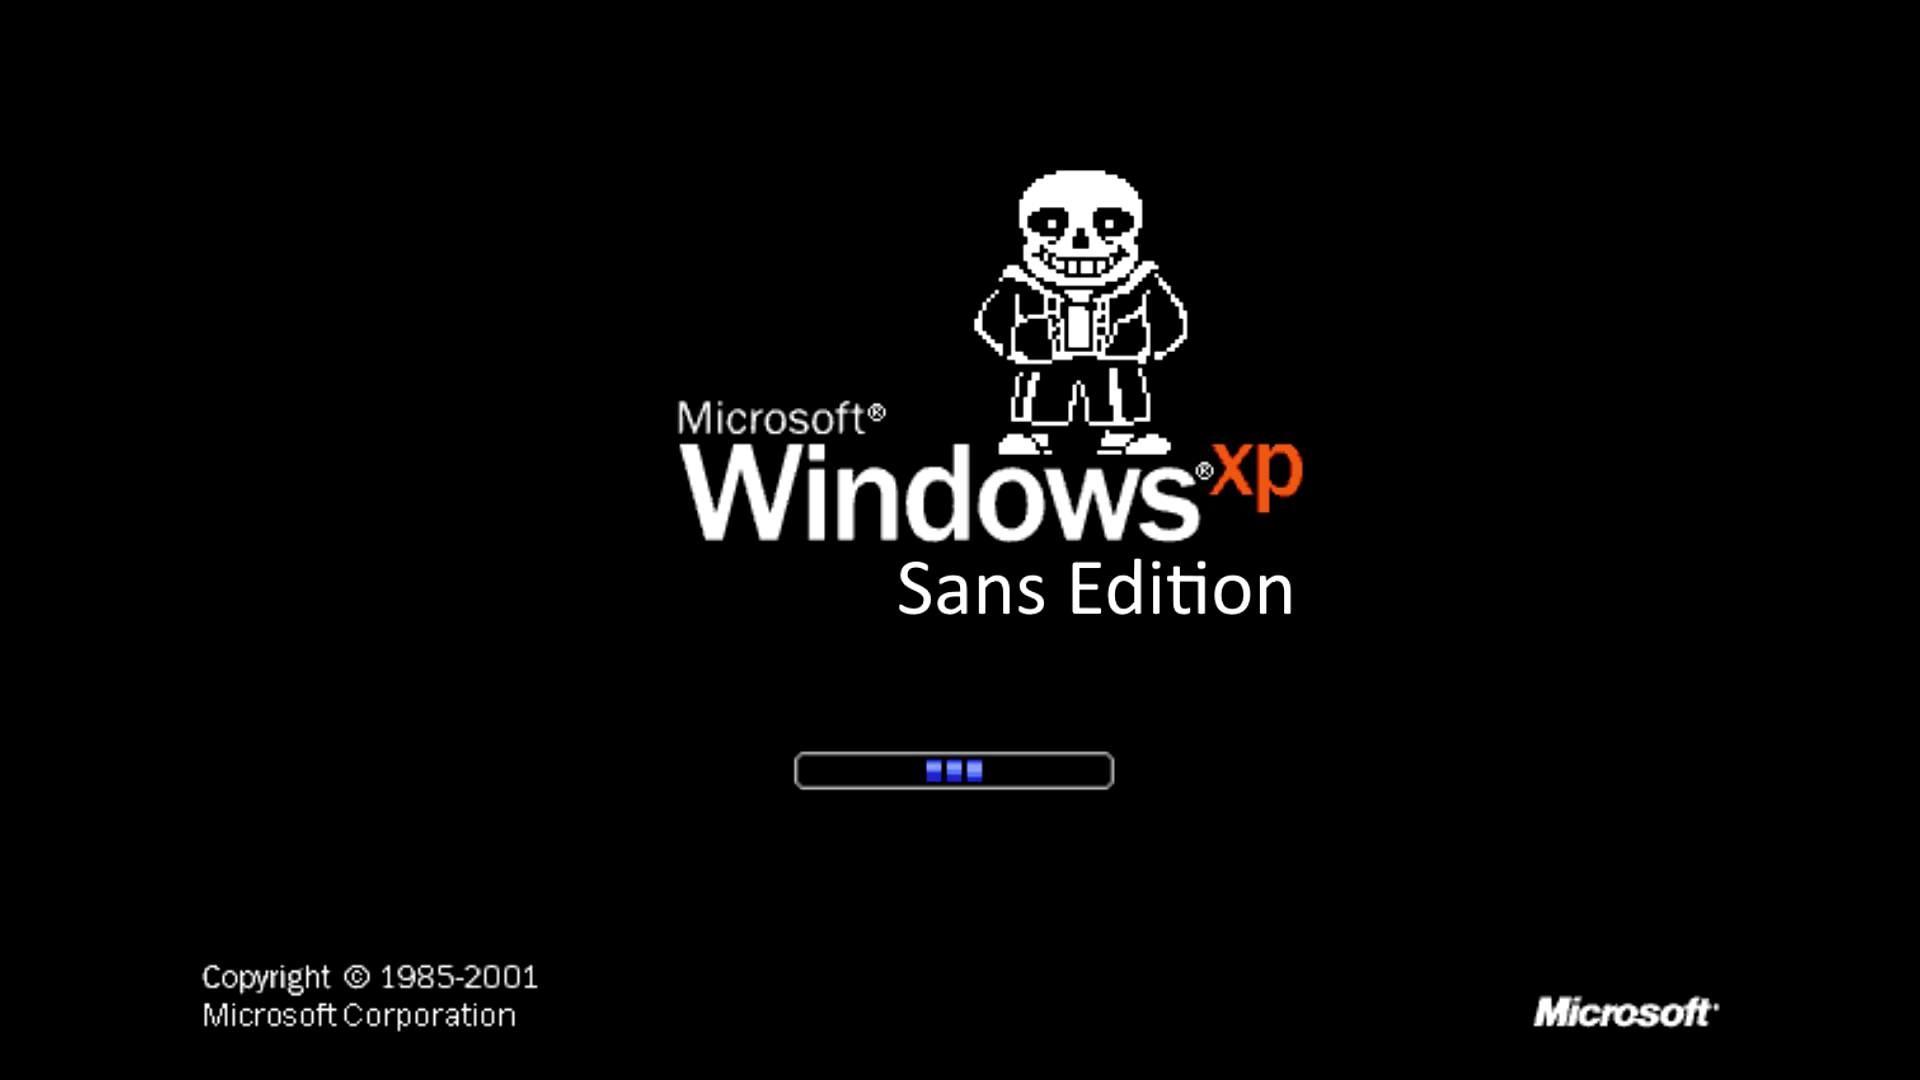 Undertale – Megalovania [Windows XP Remix]